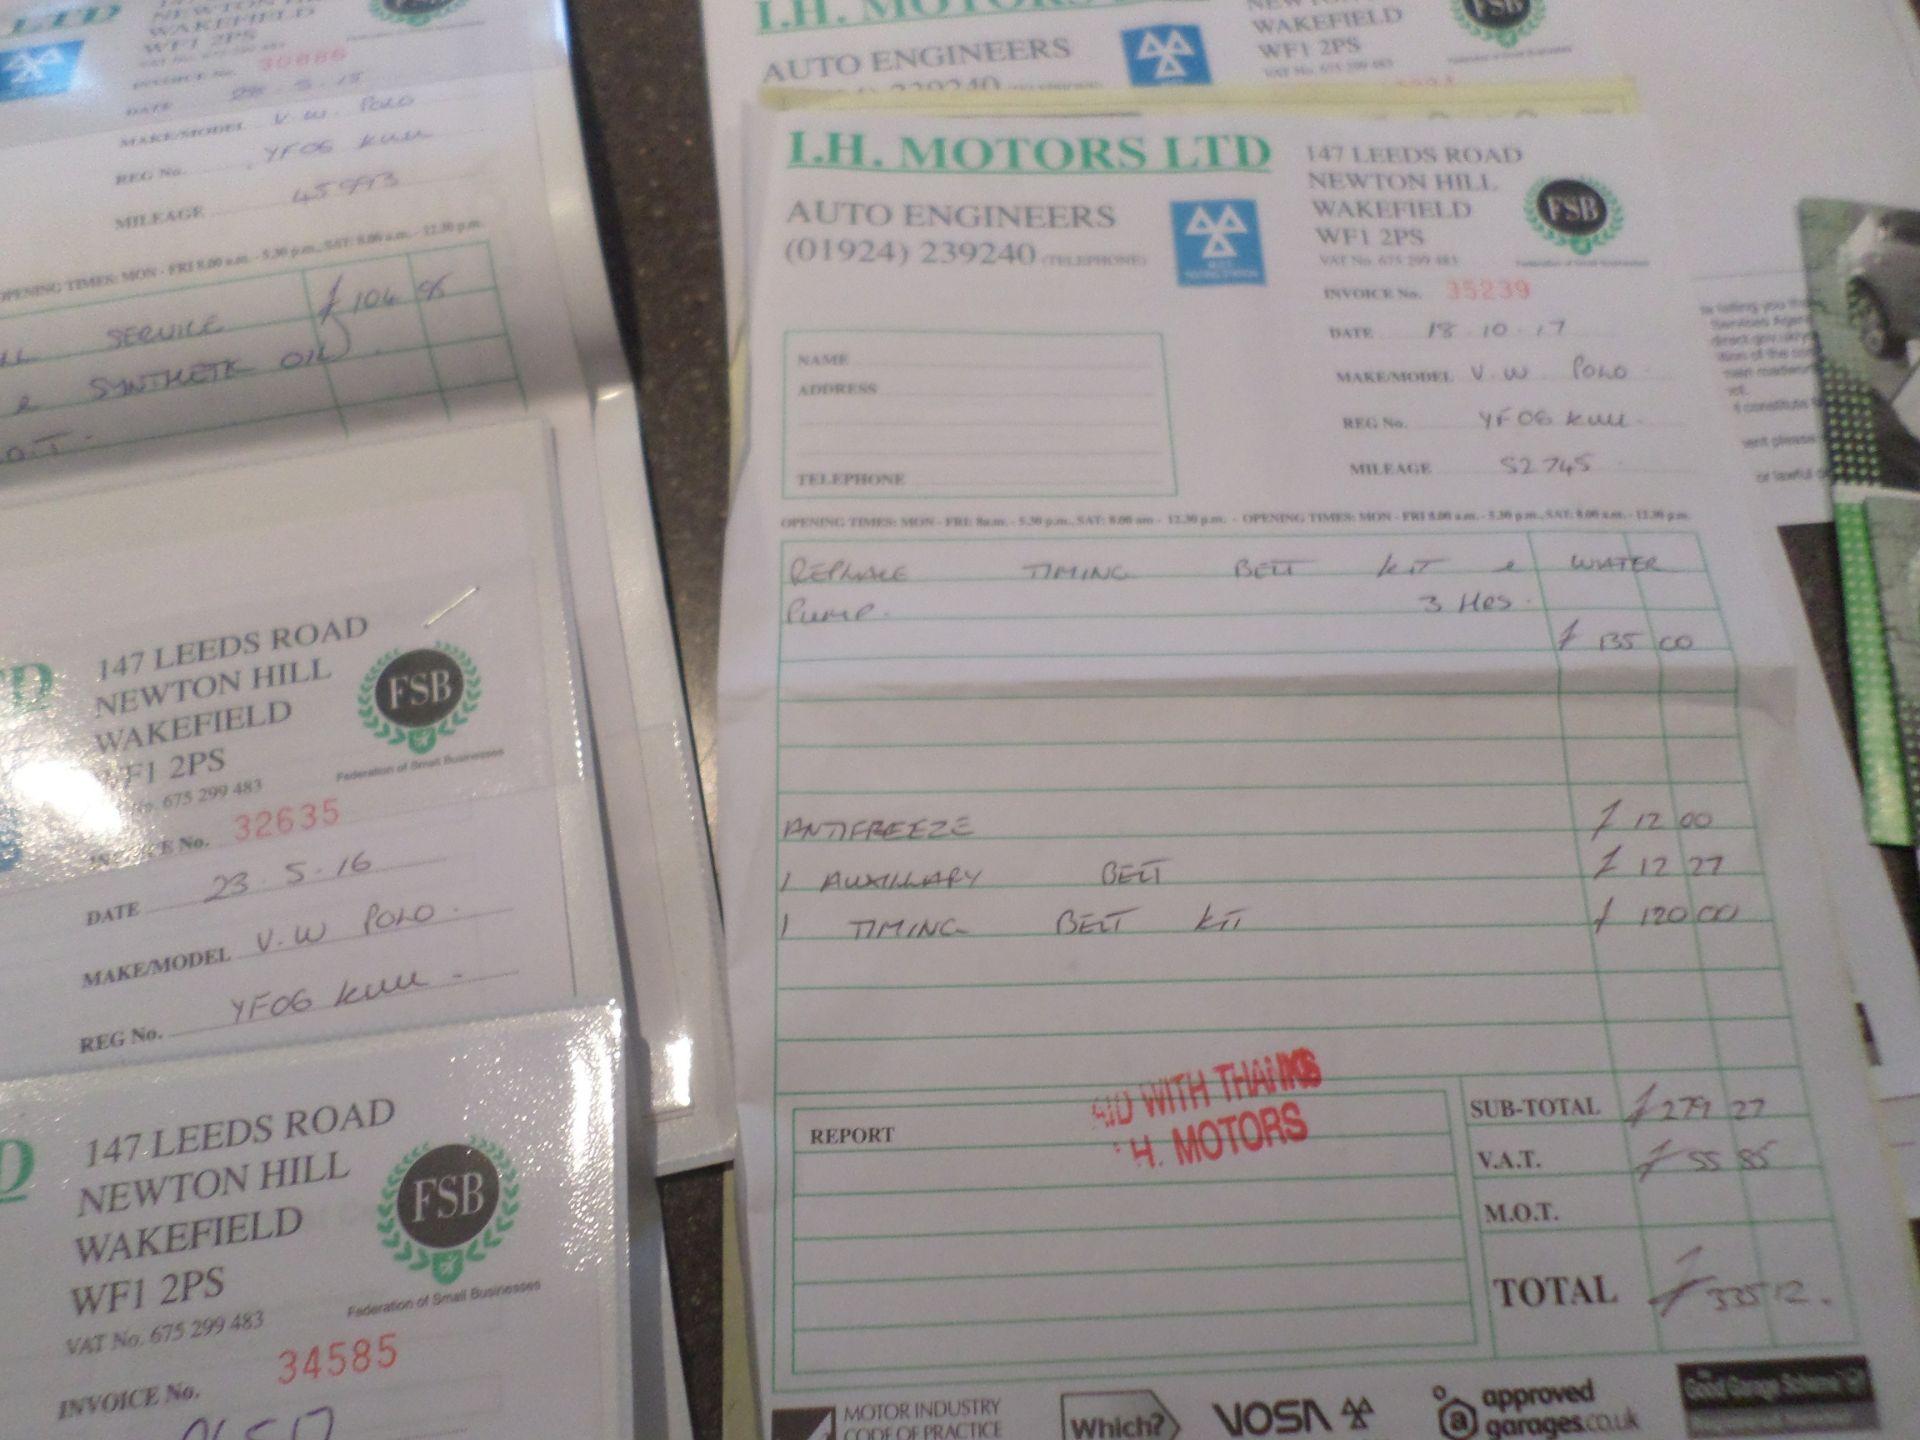 Lot 37C - 2006/06 REG VOLKSWAGEN POLO S 75 1.4 PETROL BLUE 5 DOOR HATCHBACK, FULL SERVICE HISTORY *NO VAT*